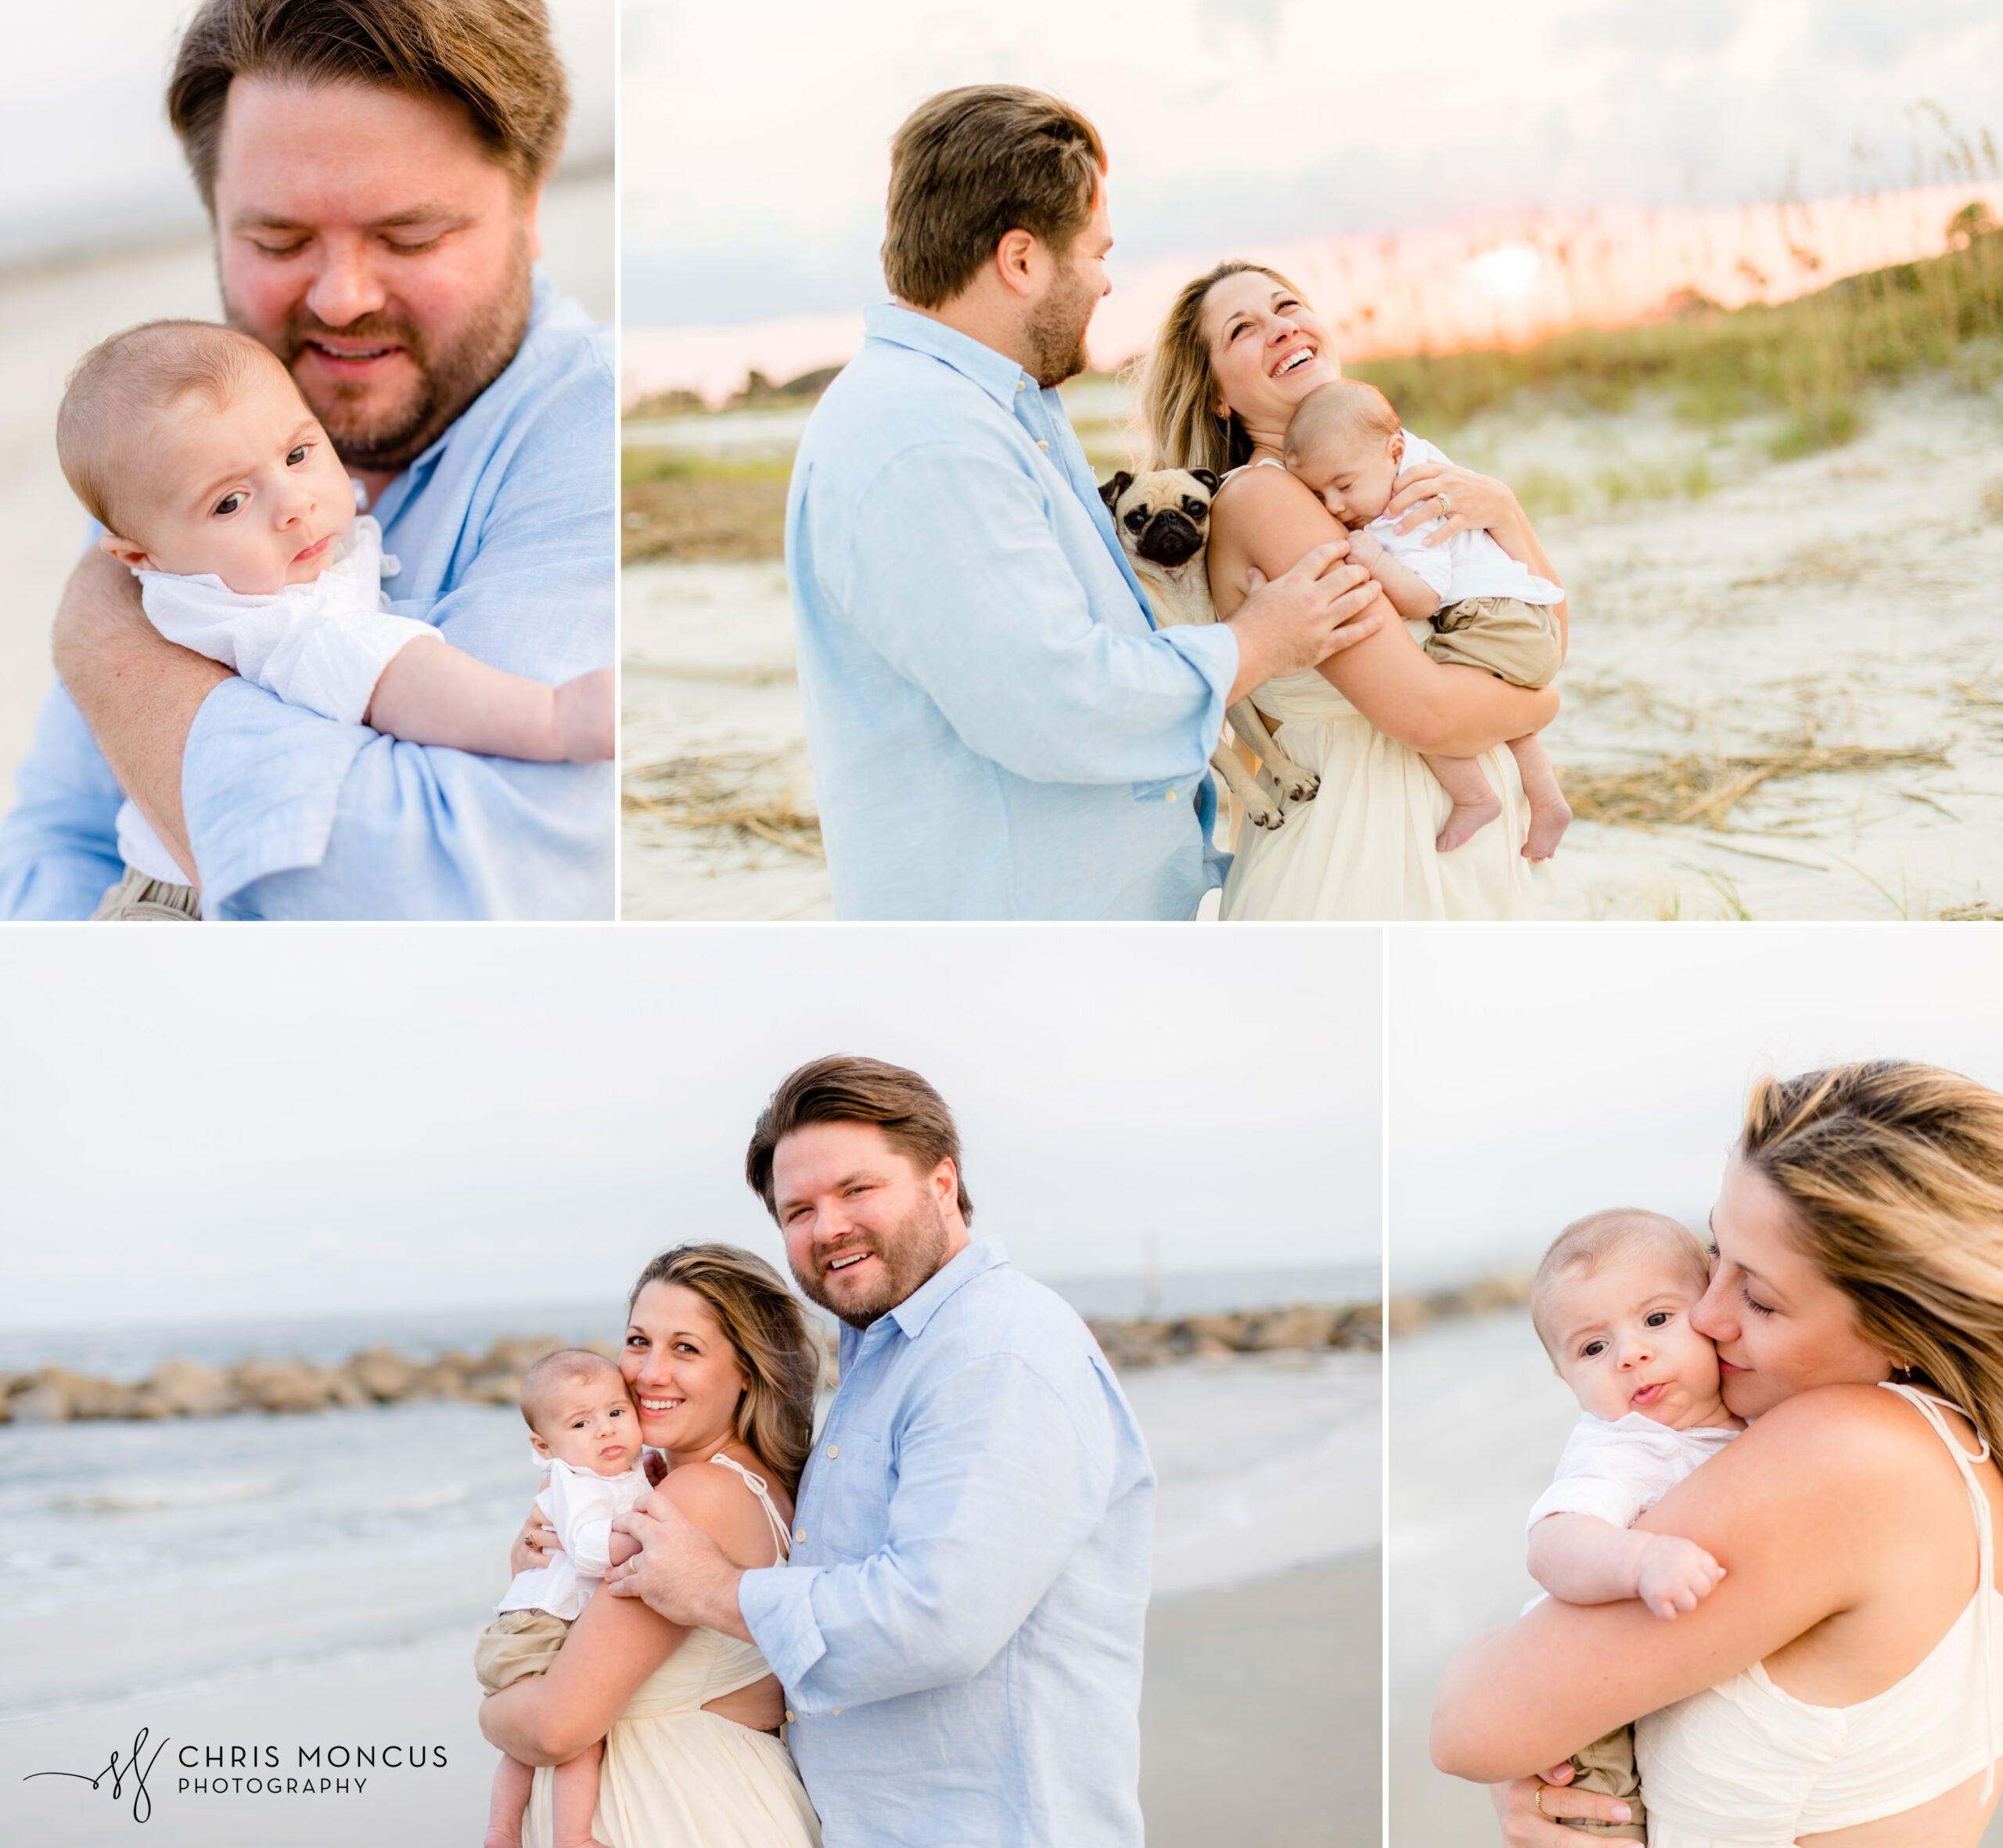 Sea Island Family Portrait Photographer